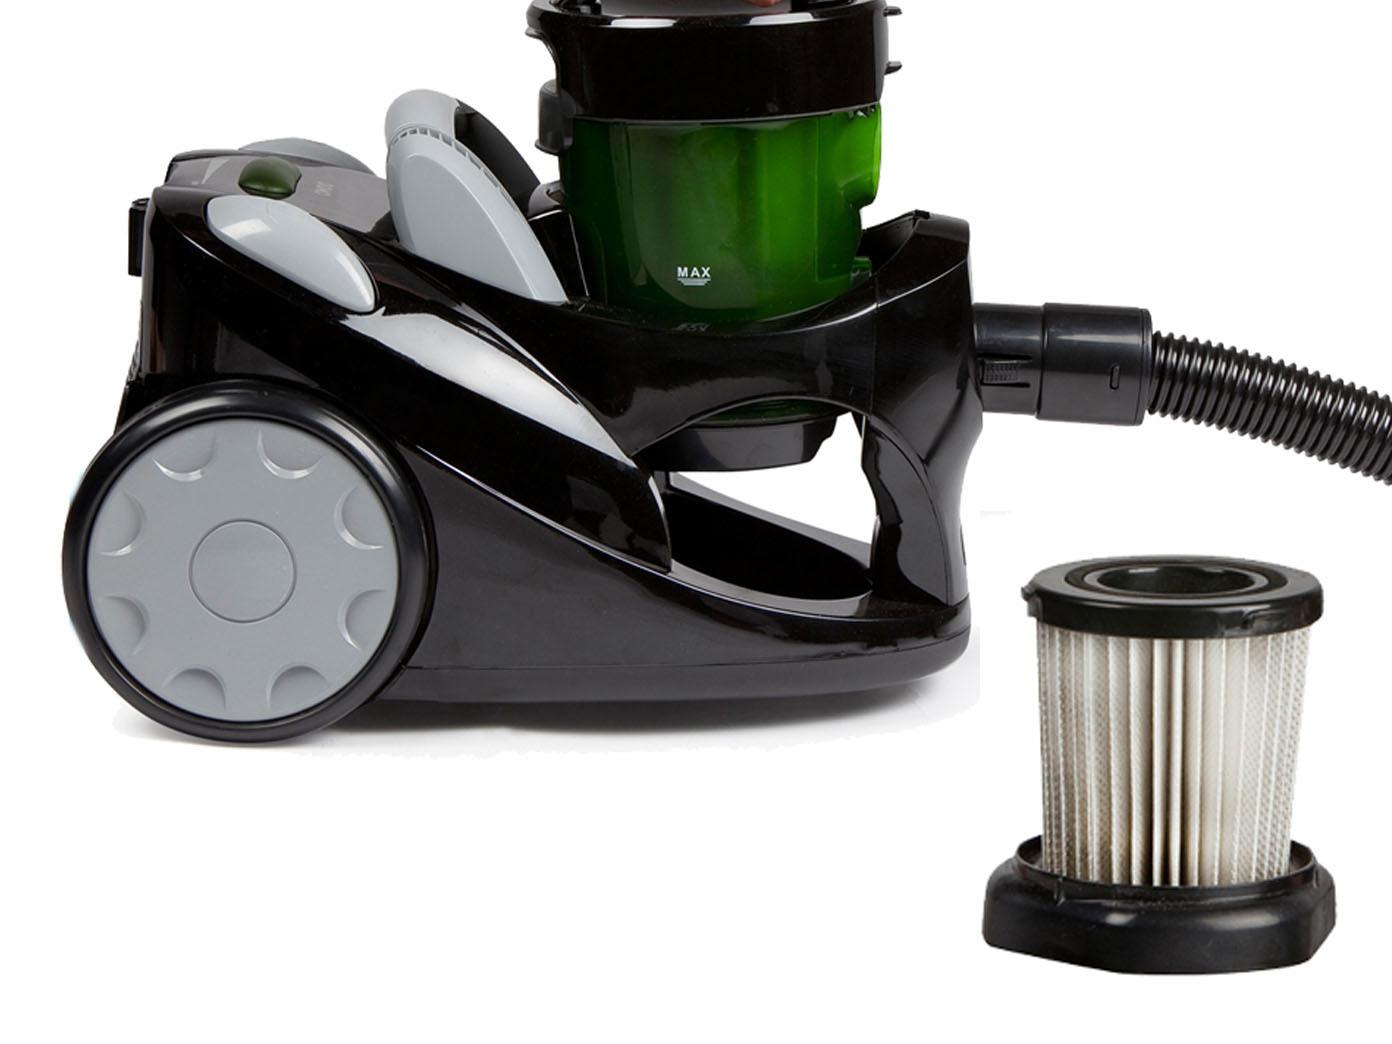 zyklon staubsauger ohne beutel inkl zusatz hepa filter. Black Bedroom Furniture Sets. Home Design Ideas